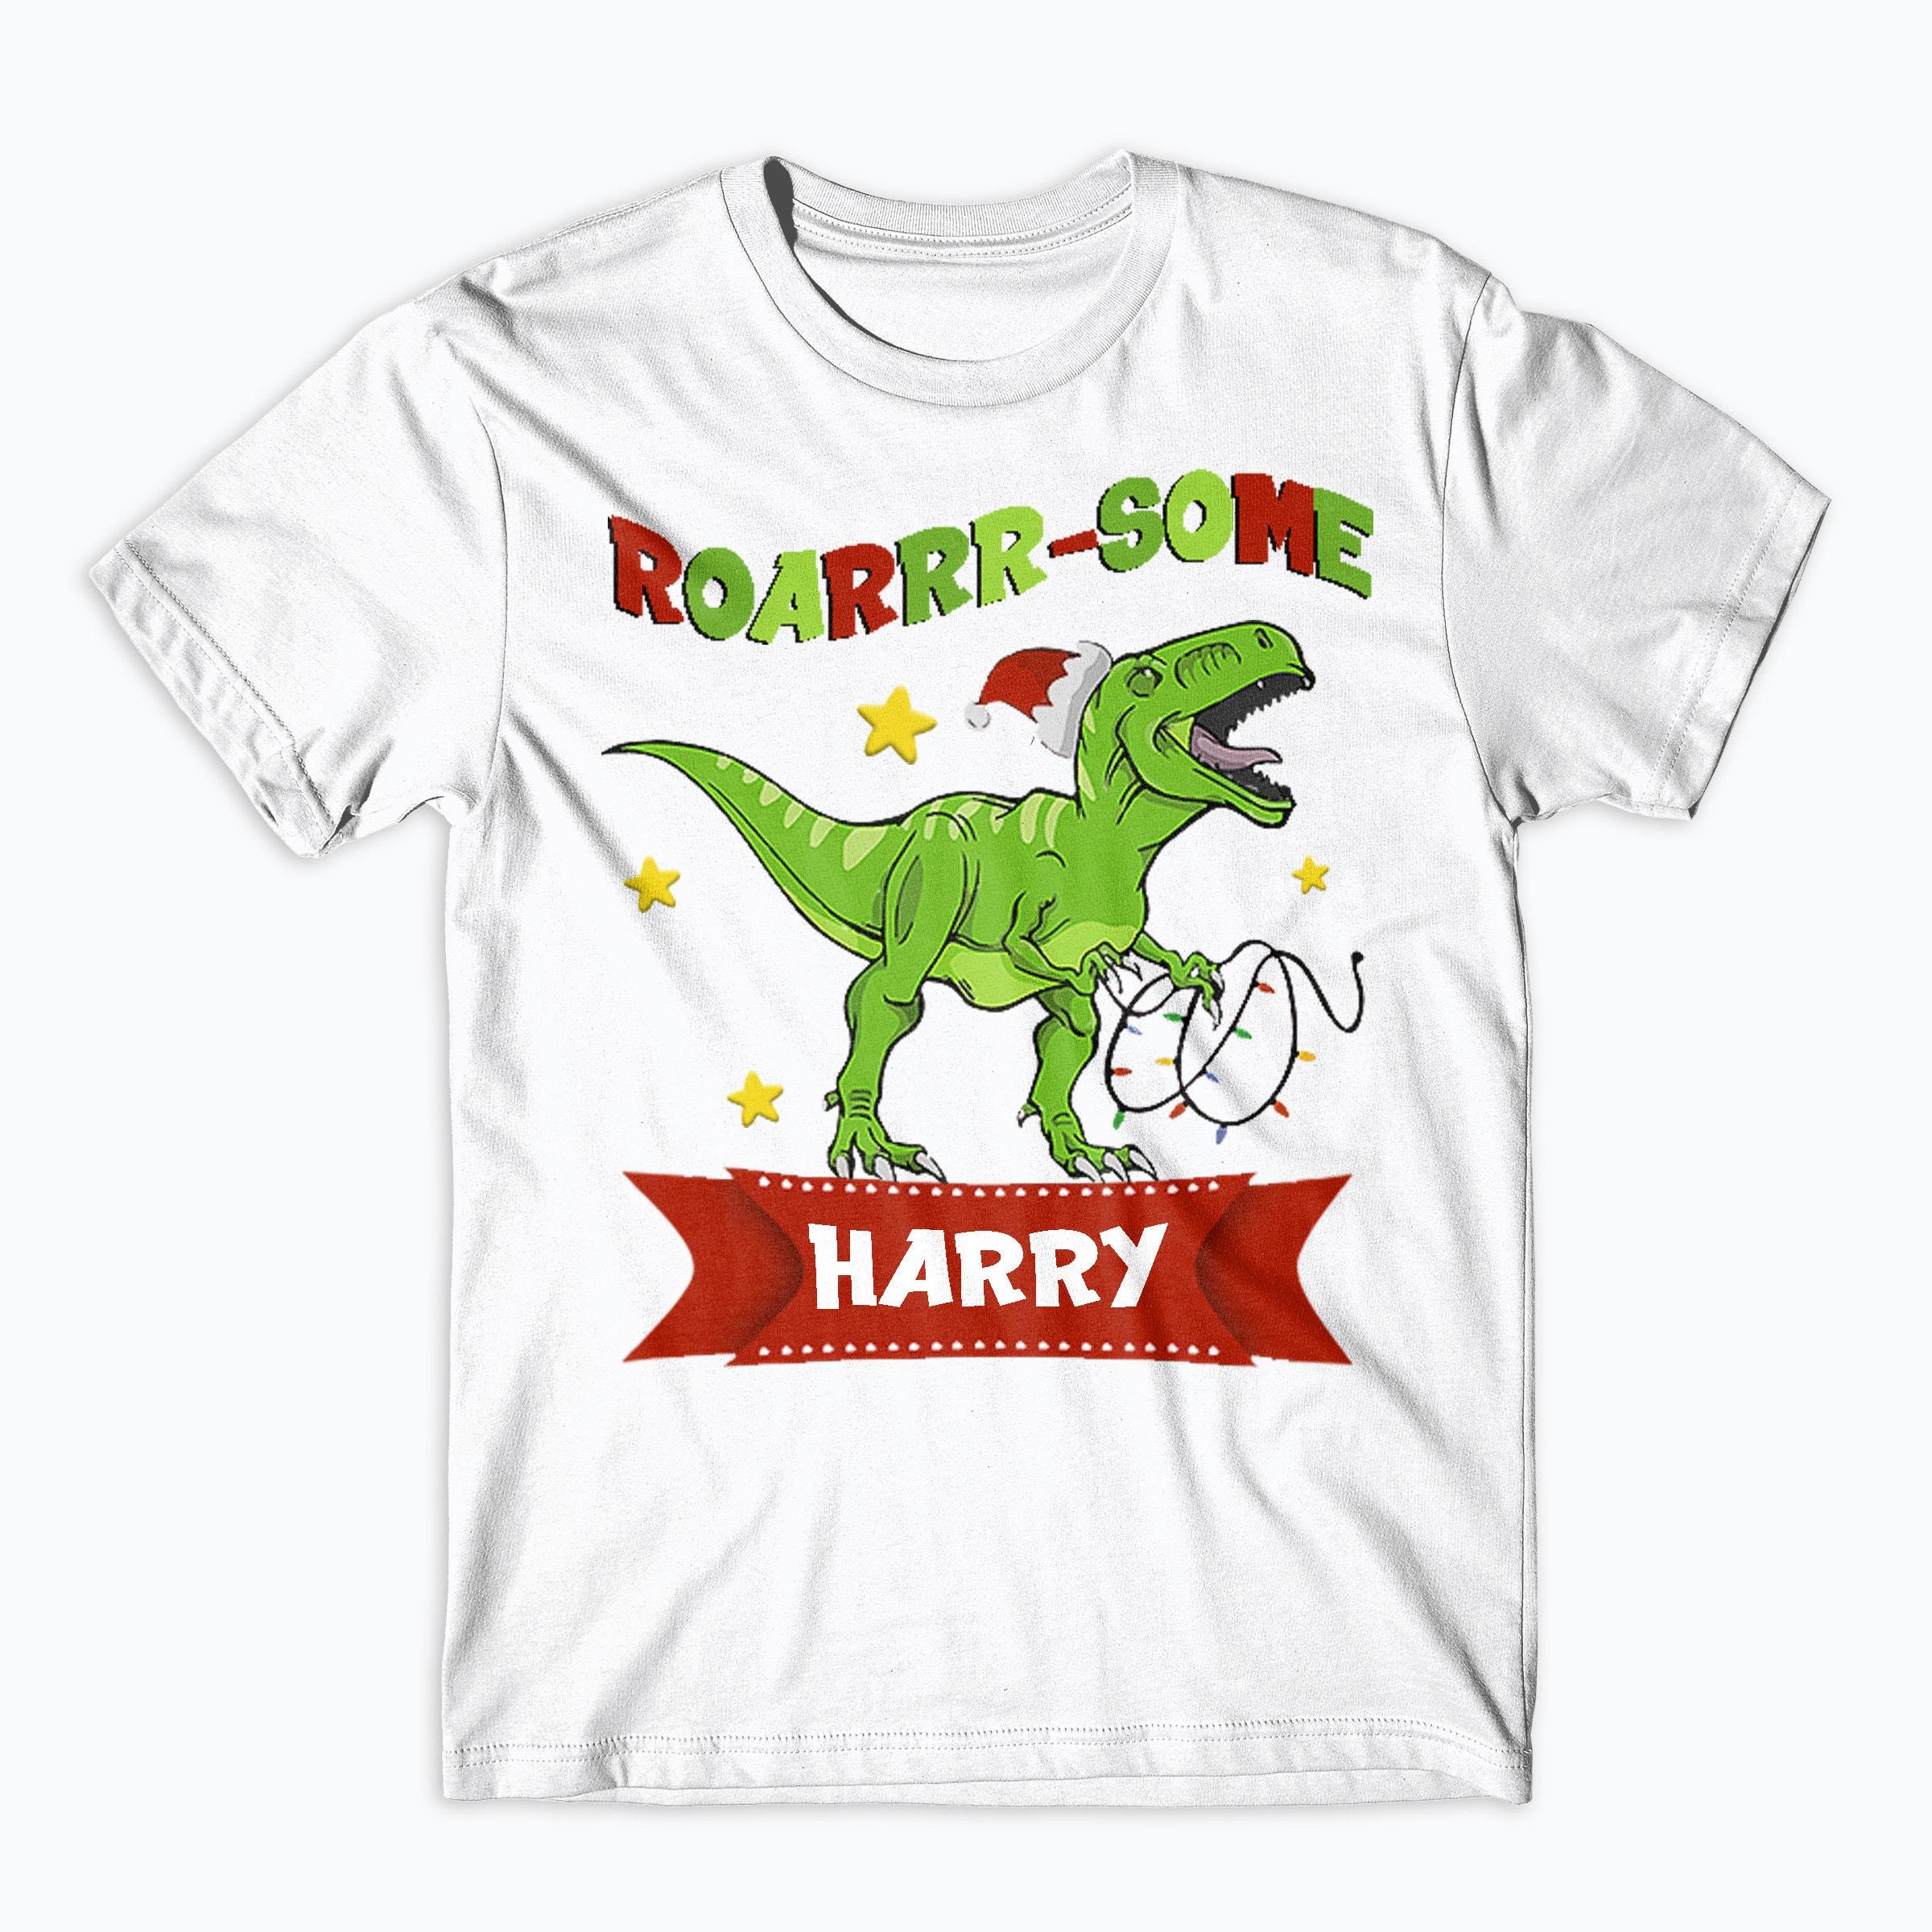 Personalised Funny Dinosaur Childs T Shirt Kids Tee Top Dino Name-Saurus Named